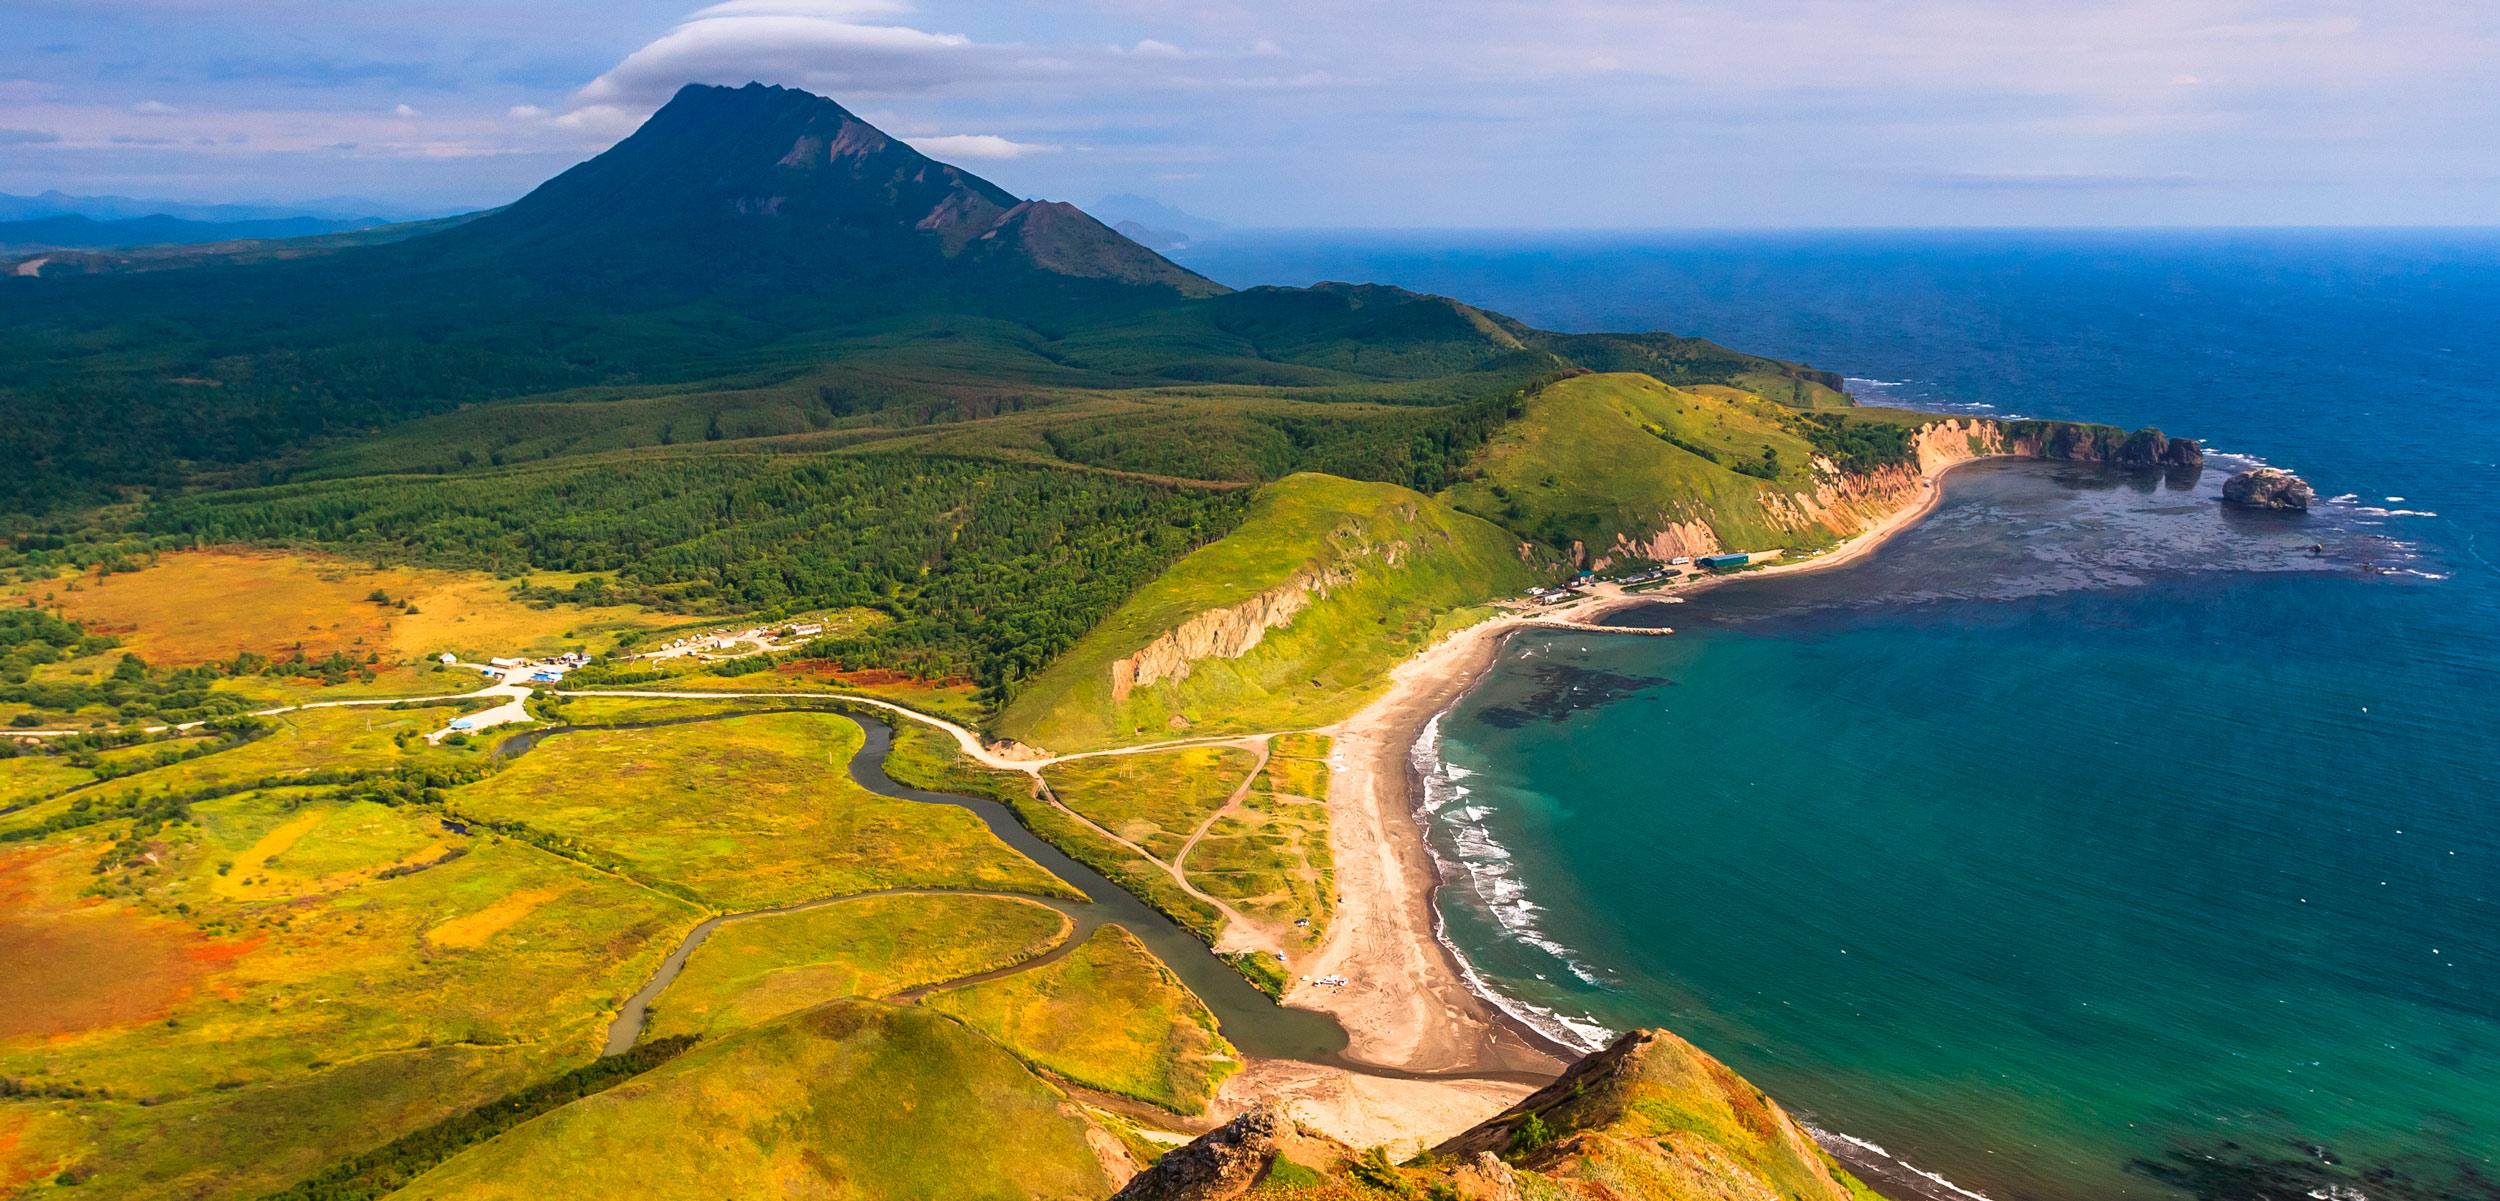 Tikhaya Bay, Sakhalin Island, Russia